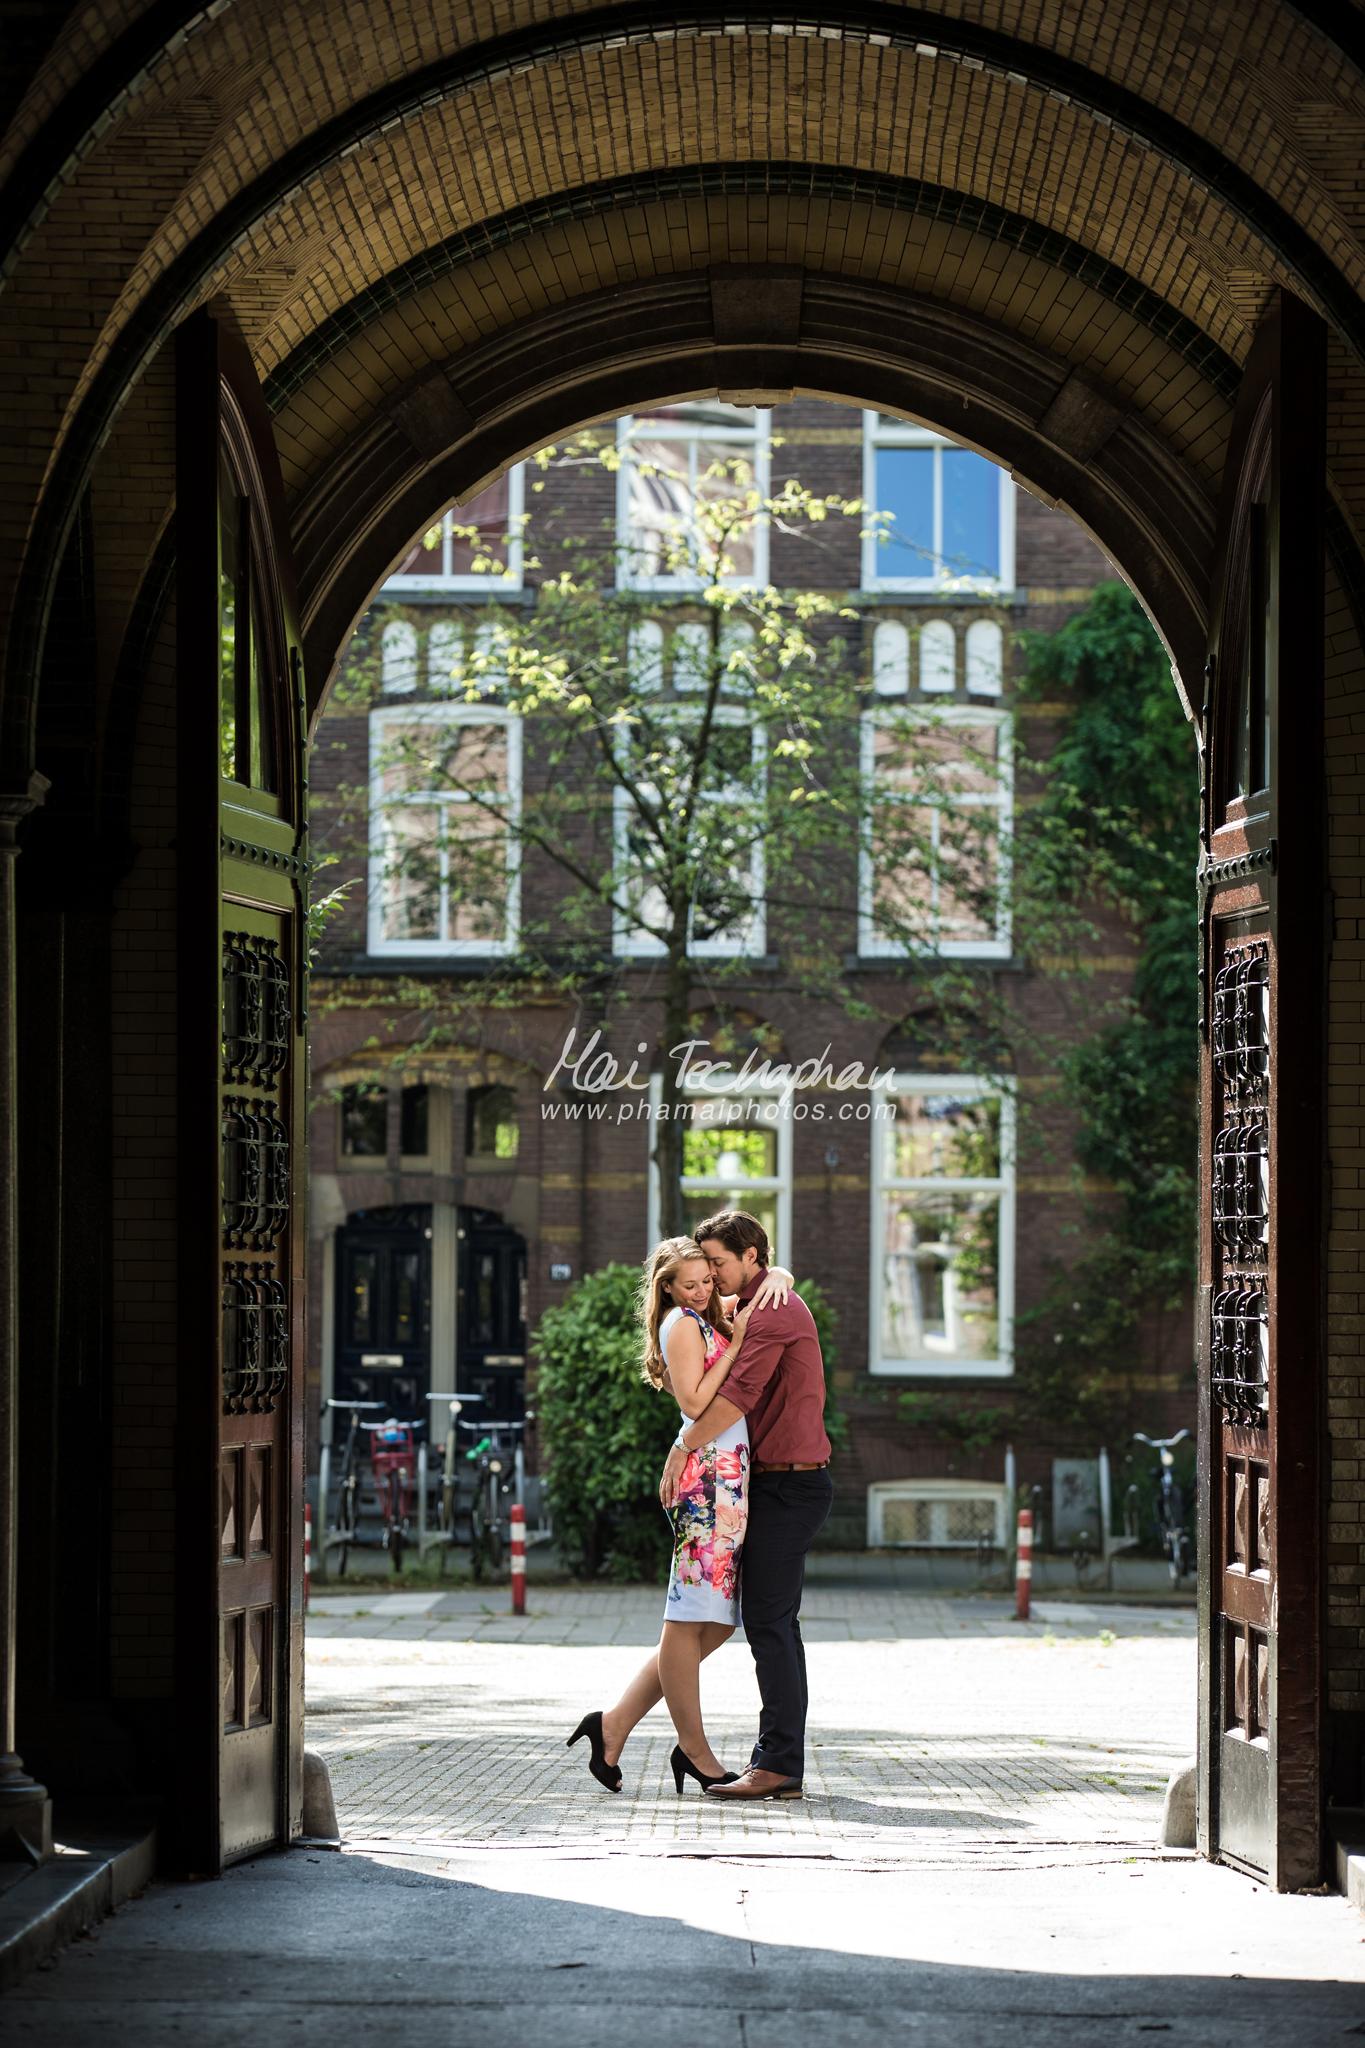 Dax-Sophie-Holland-Pre-Wedding-11.jpg